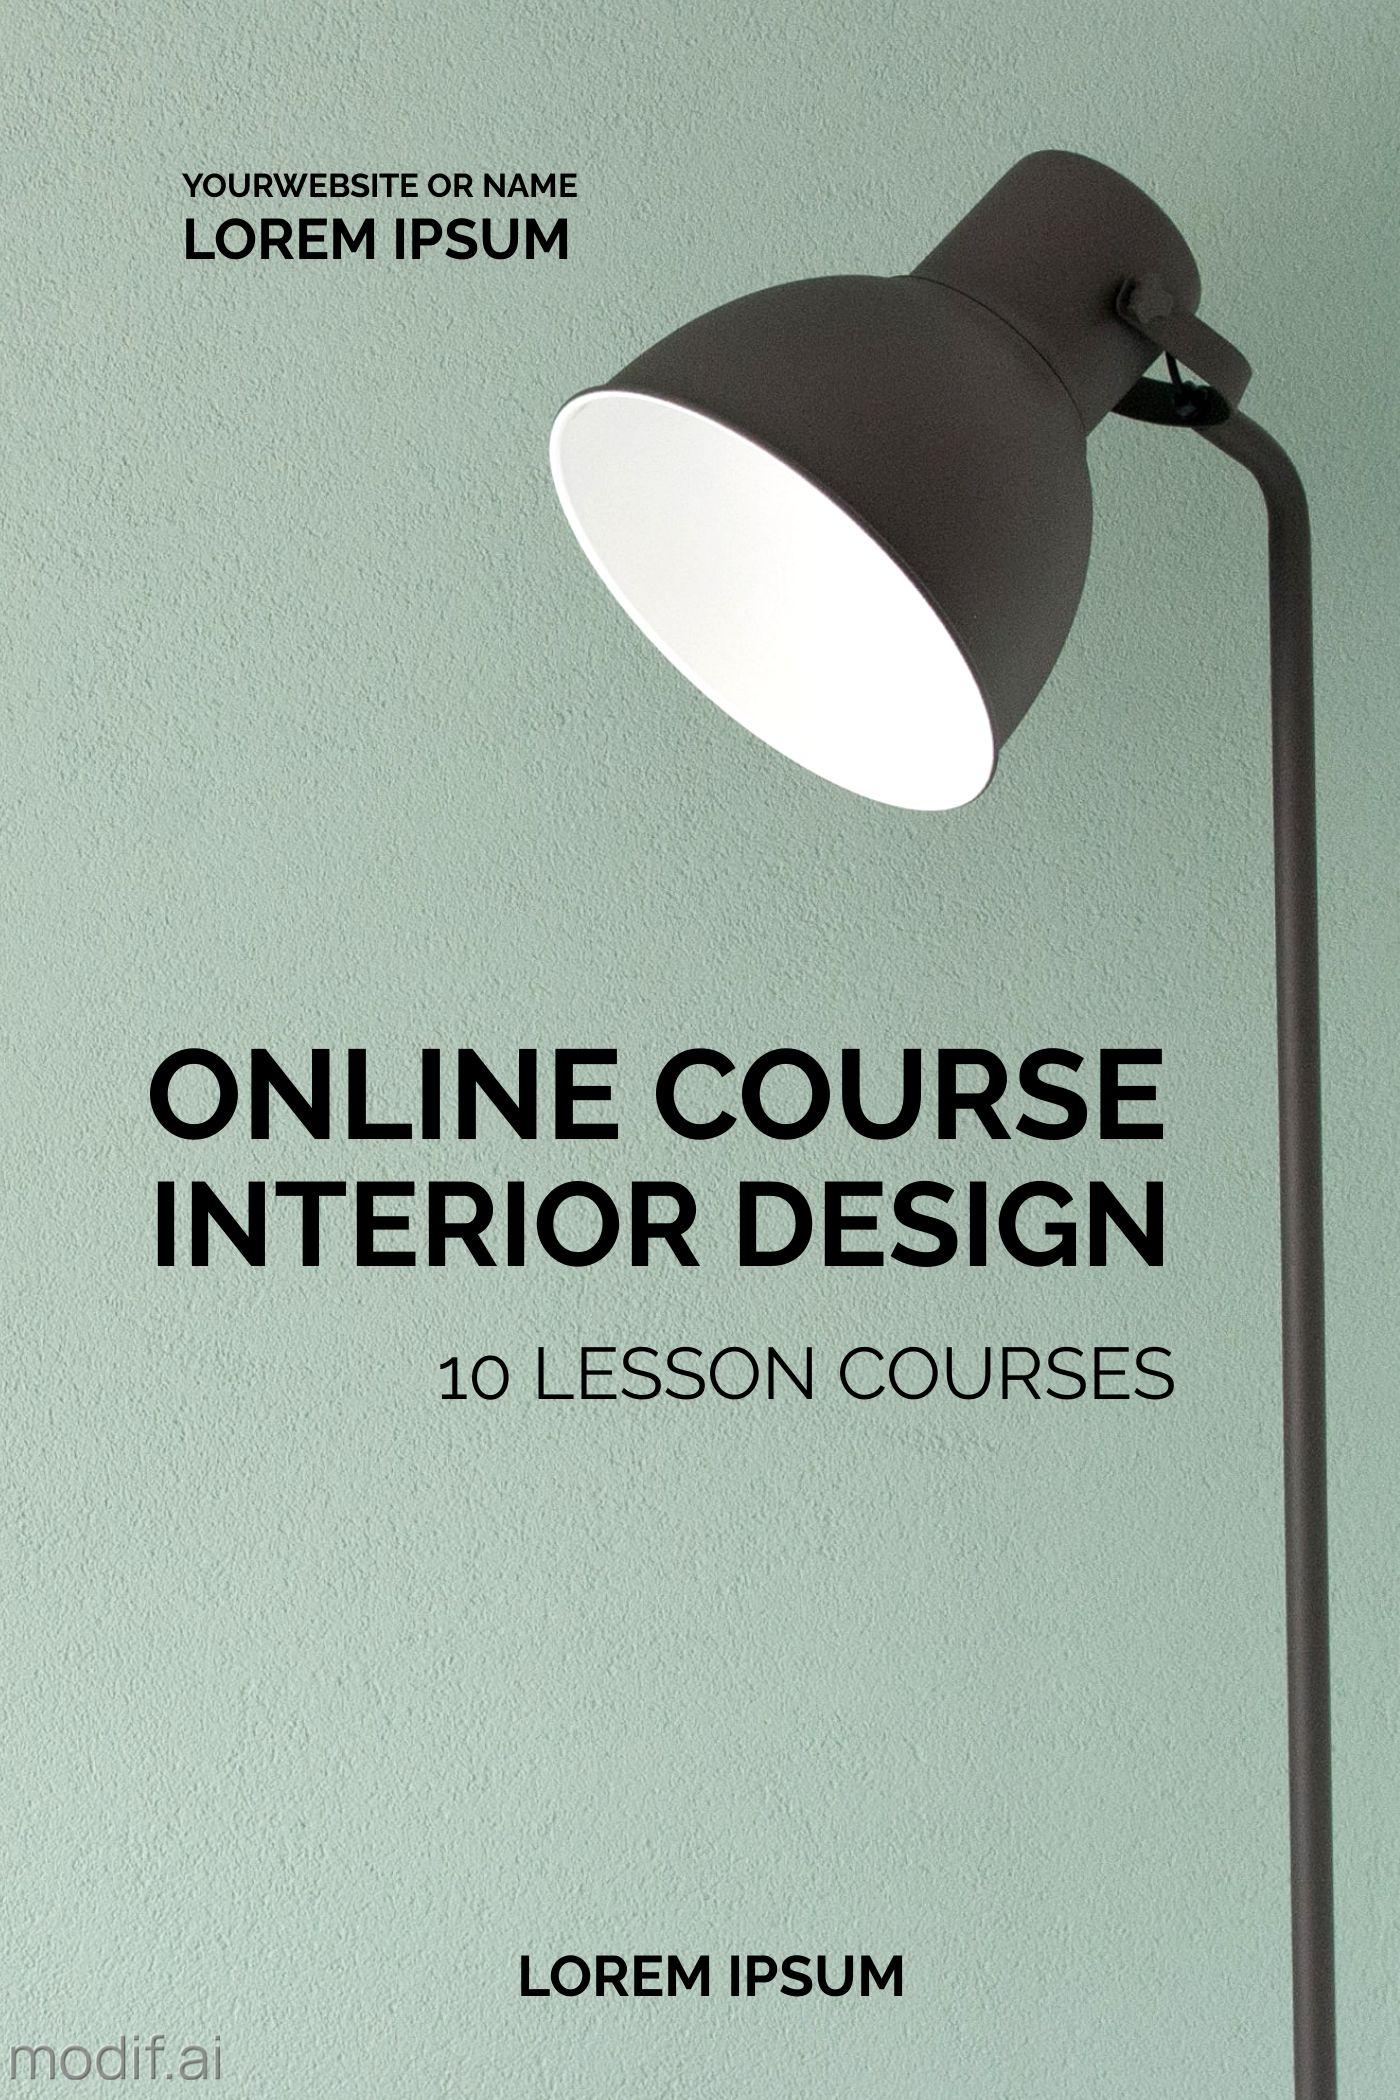 Interior Design Online Course Template